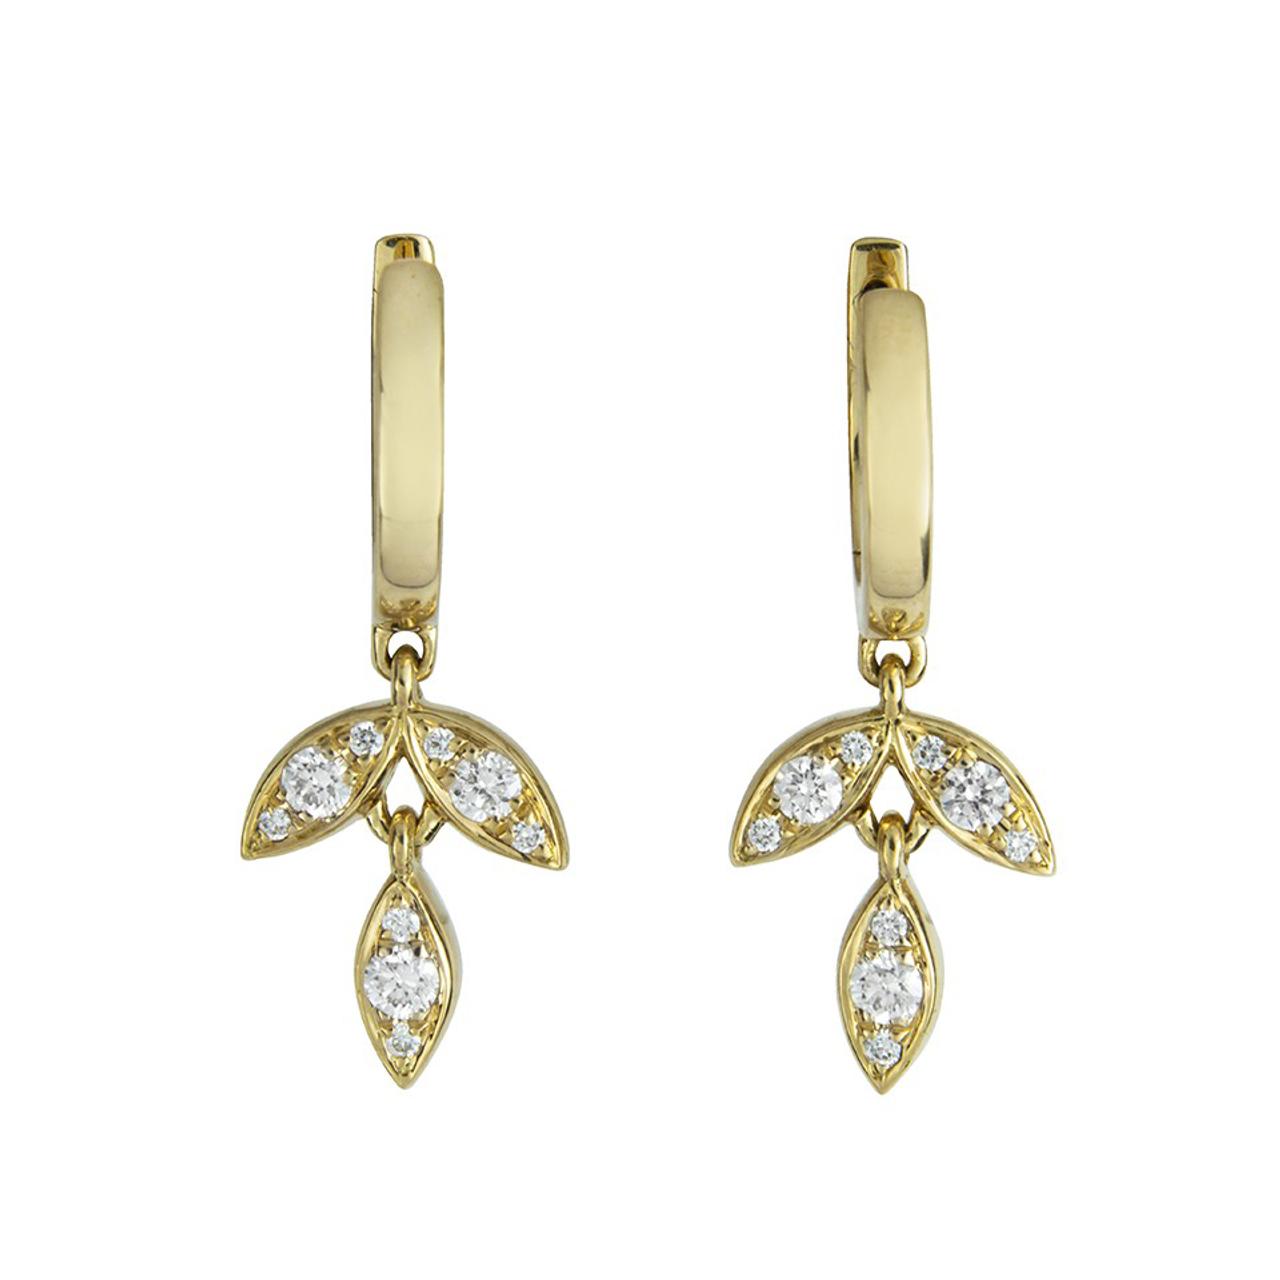 18ct Yellow Gold & Diamond set Barleycorn Drop Earrings